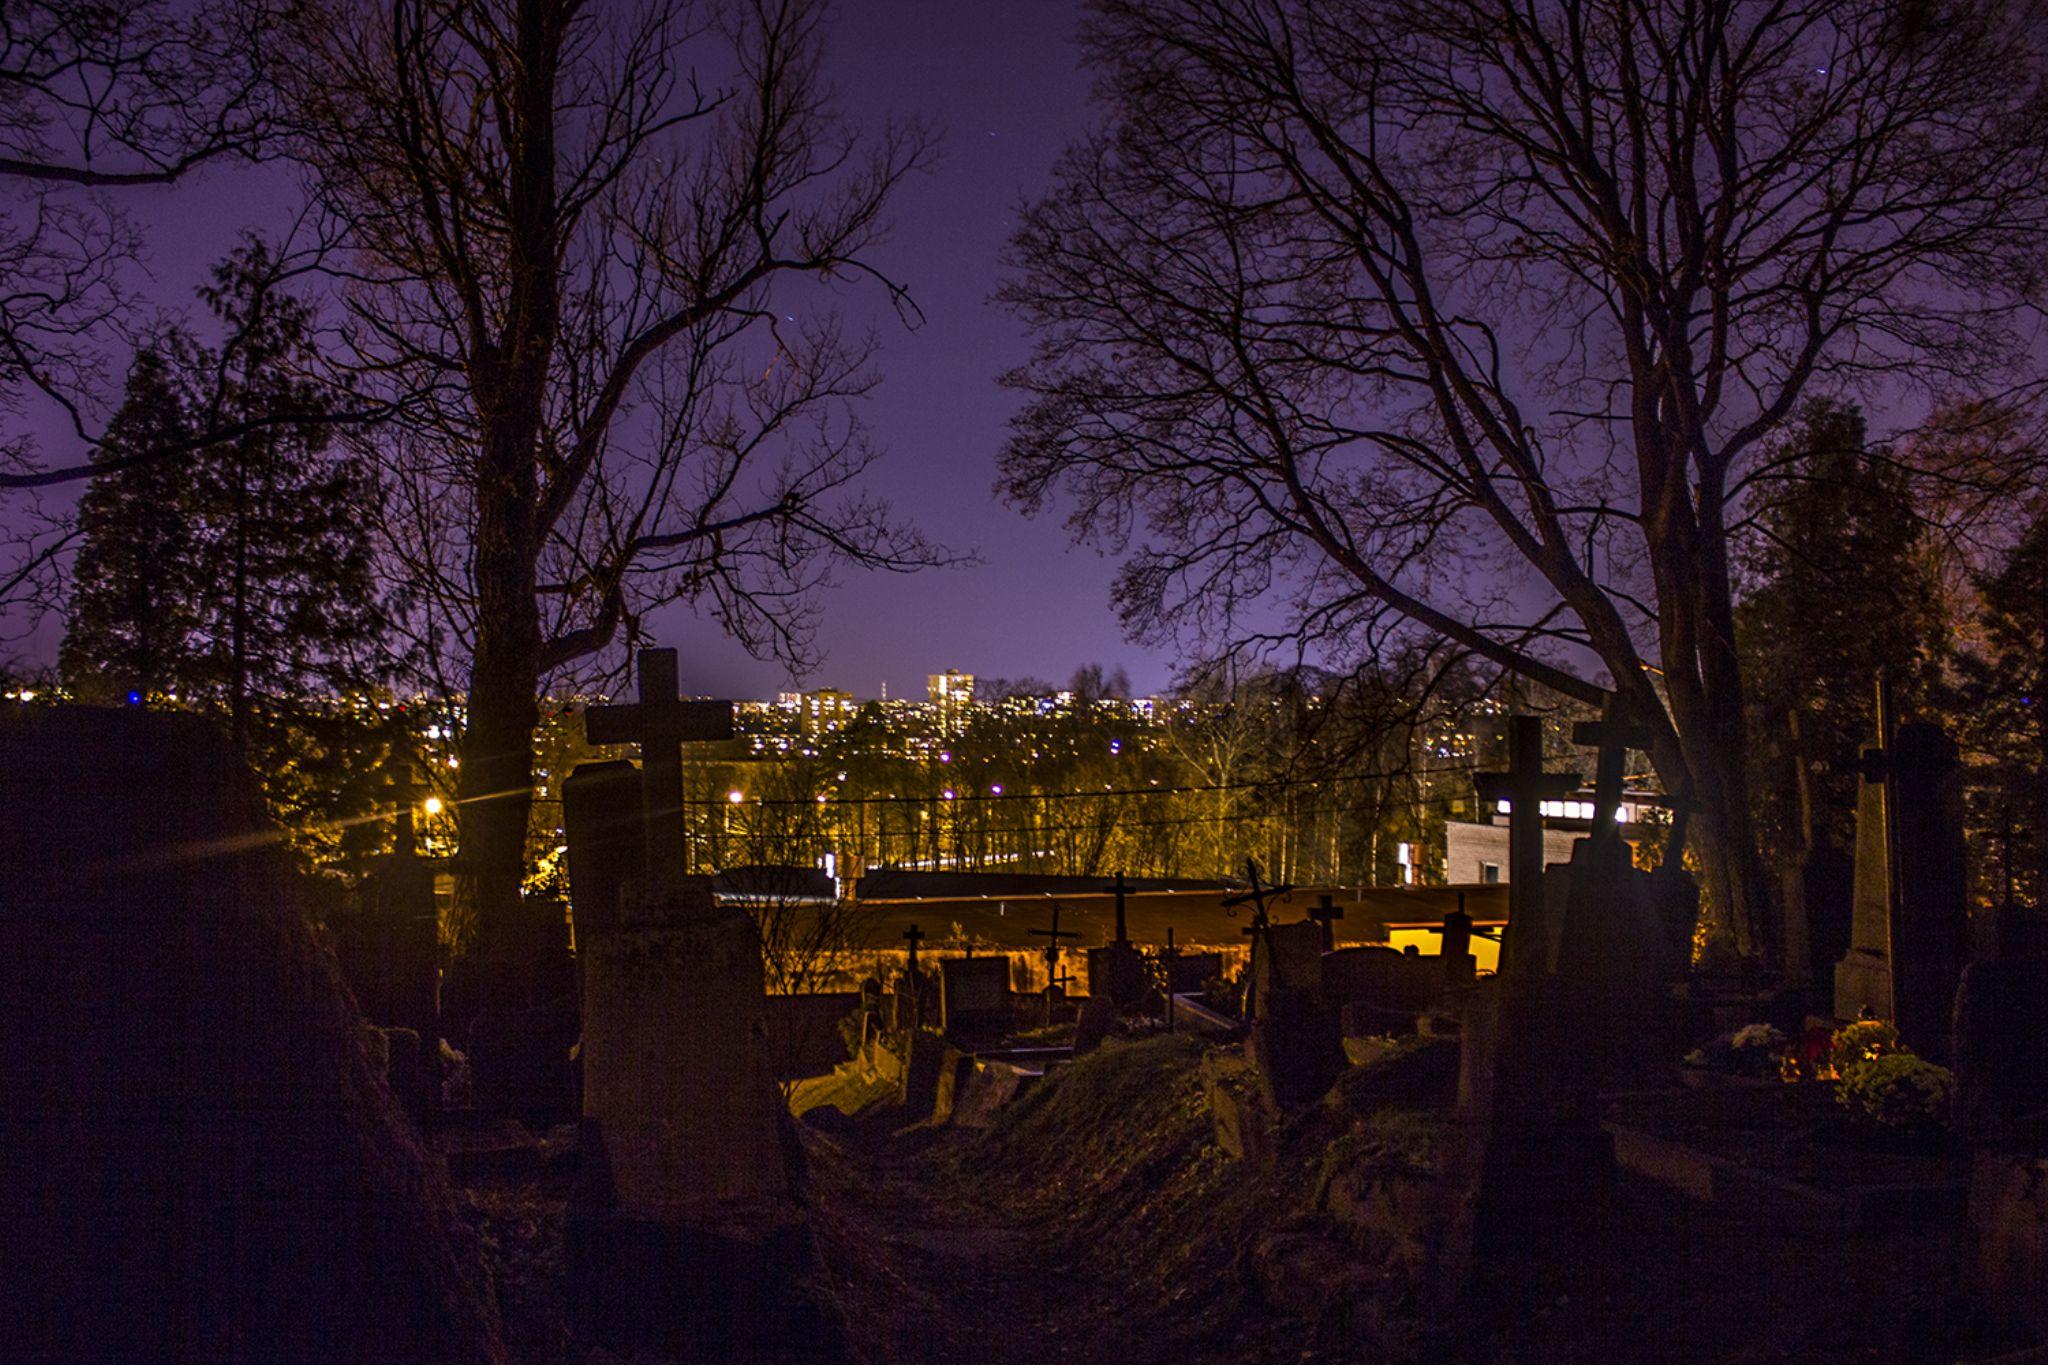 night at the cemetery by Jurij Kolesnikov